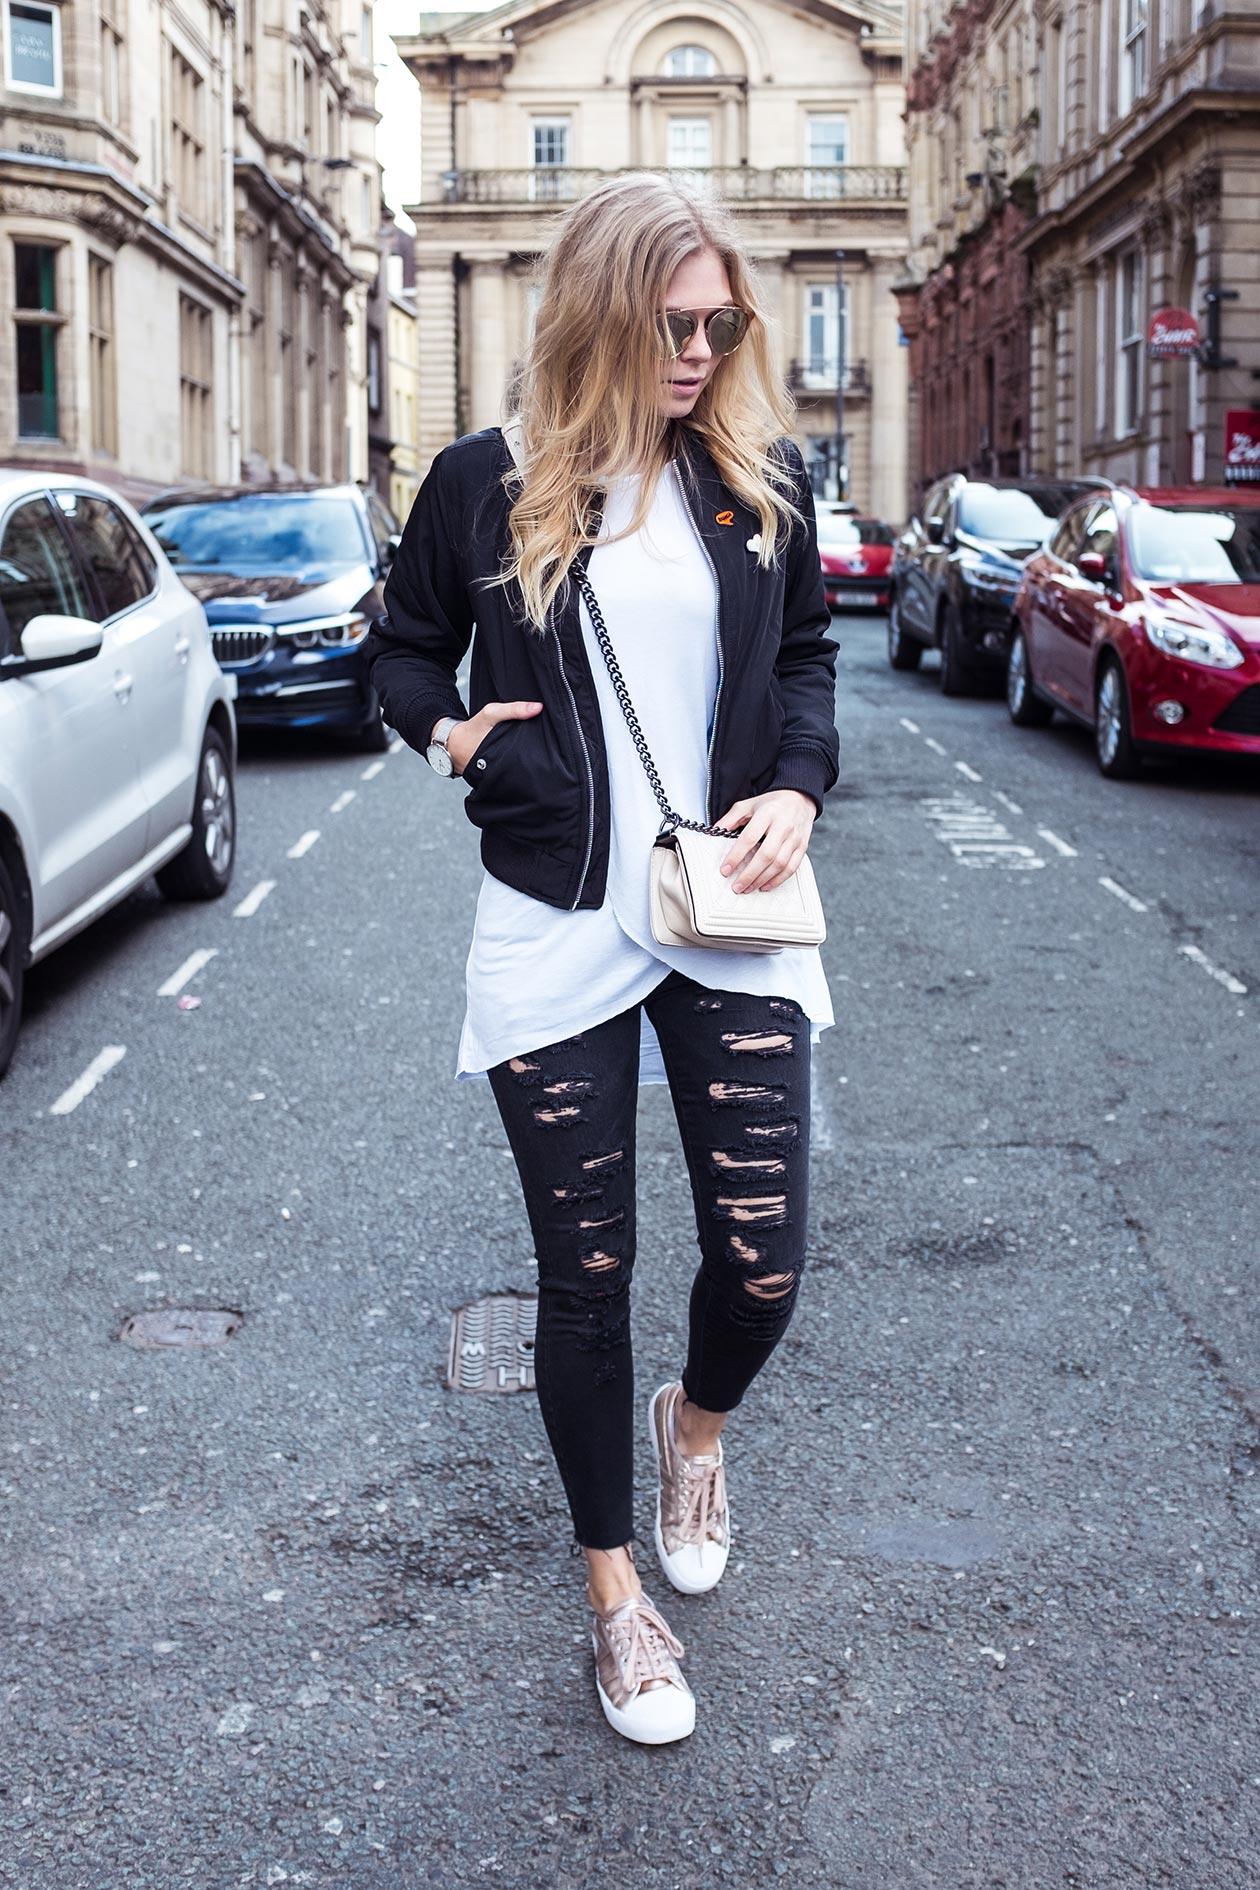 Sunyinga Fashionblog Outfit Streetstyle Gola Sneaker Bomberjacke Sonnenbrille